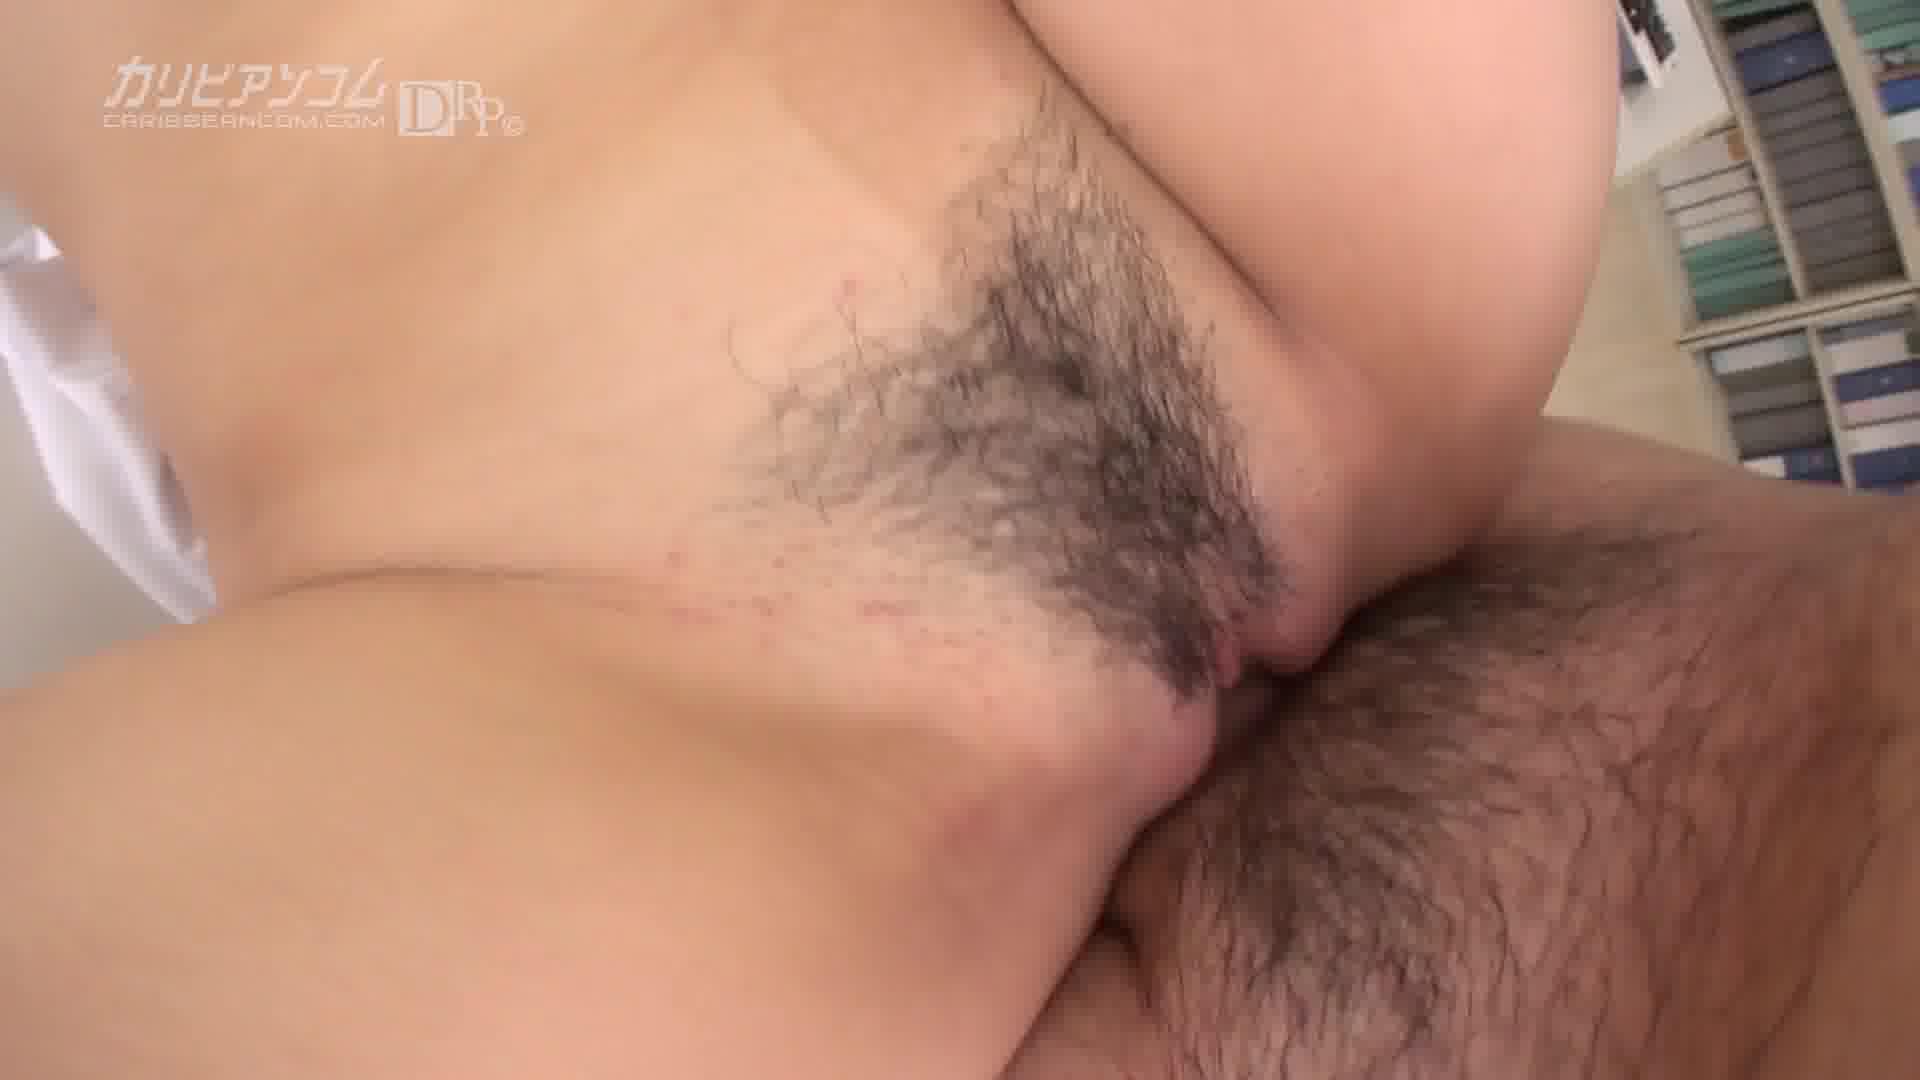 OLの尻に埋もれたい Vol.4 - RYU【痴女・OL・美尻】